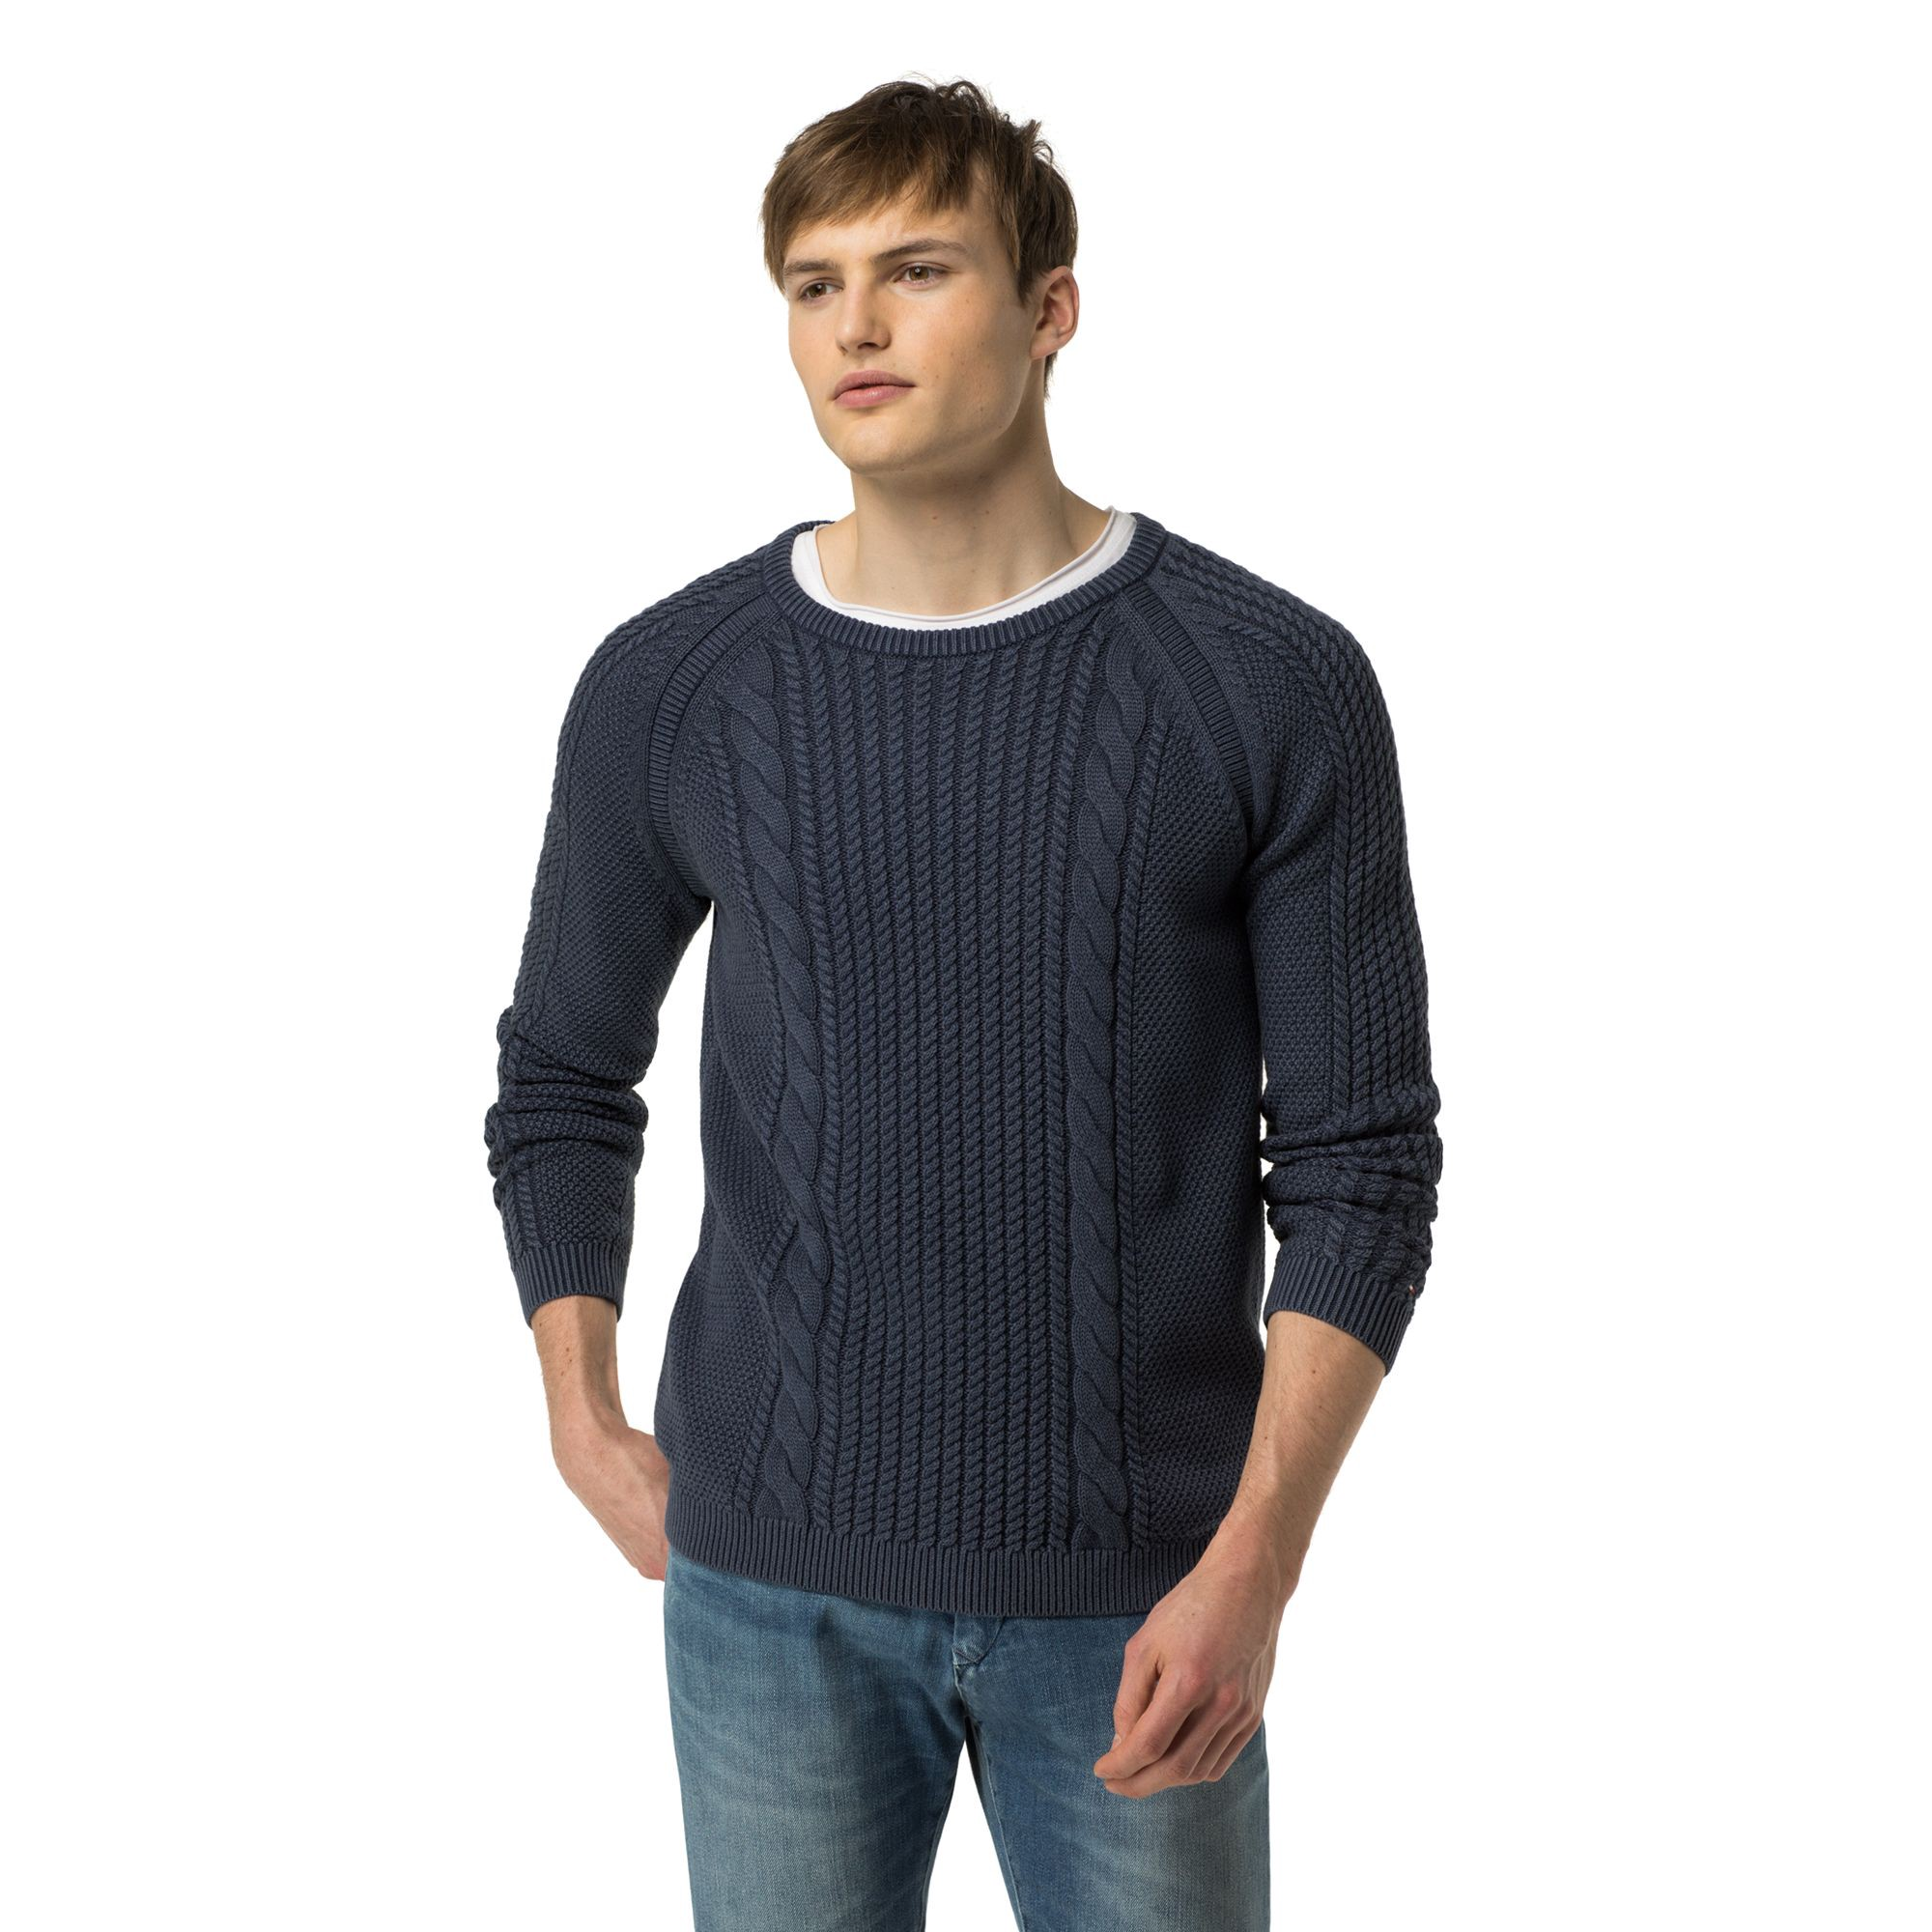 TOMMY HILFIGER Cableknit Sweater - Indigo